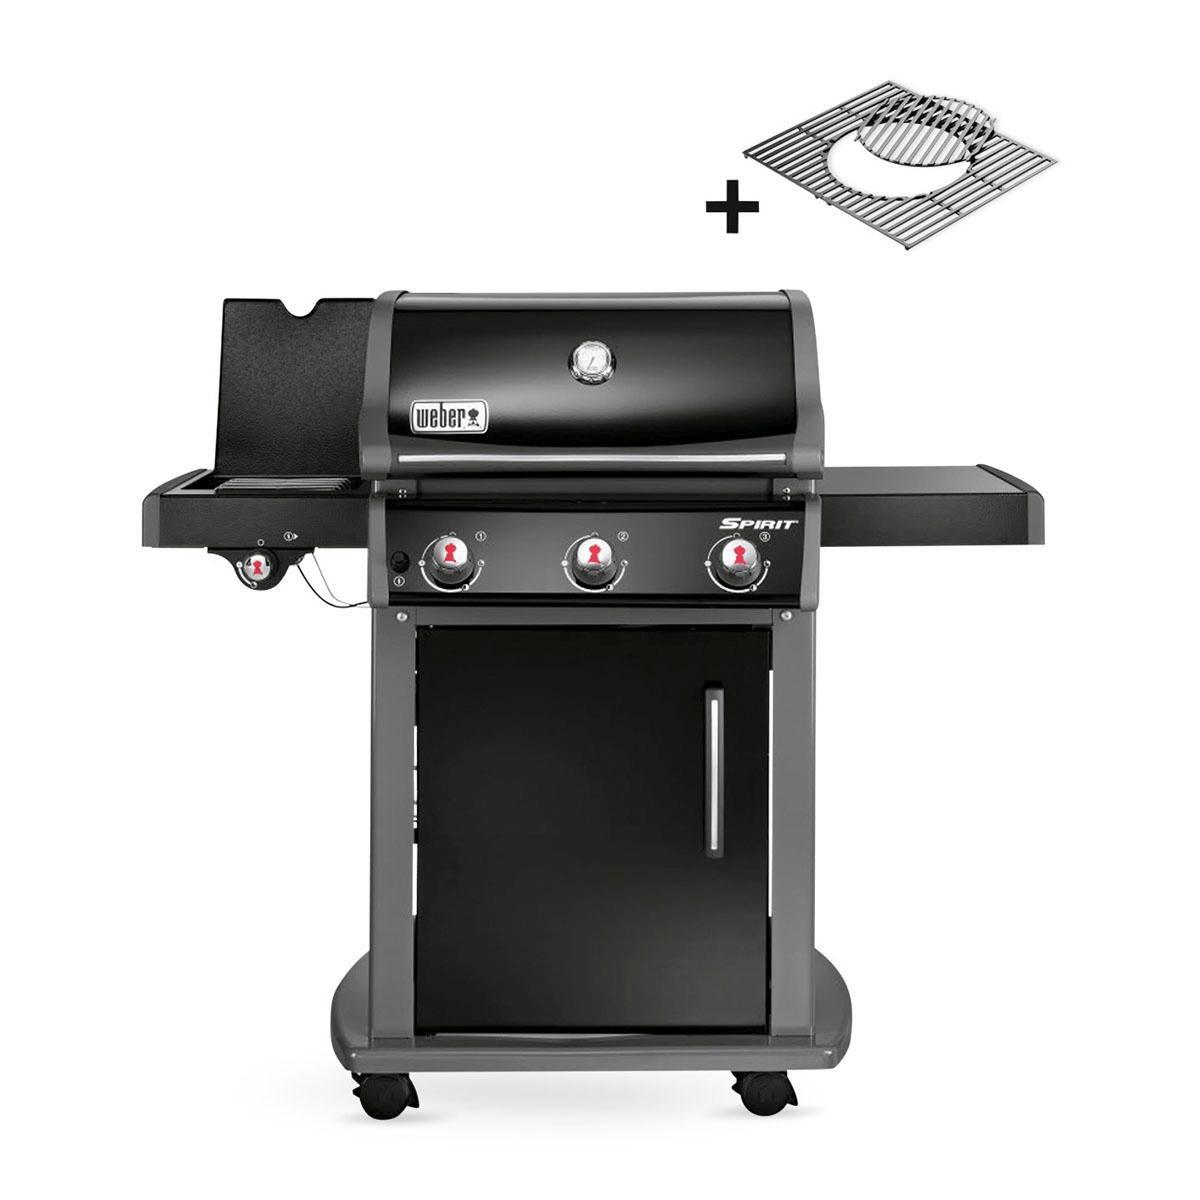 weber spirit e320 original gbs black 46613679 grill co. Black Bedroom Furniture Sets. Home Design Ideas